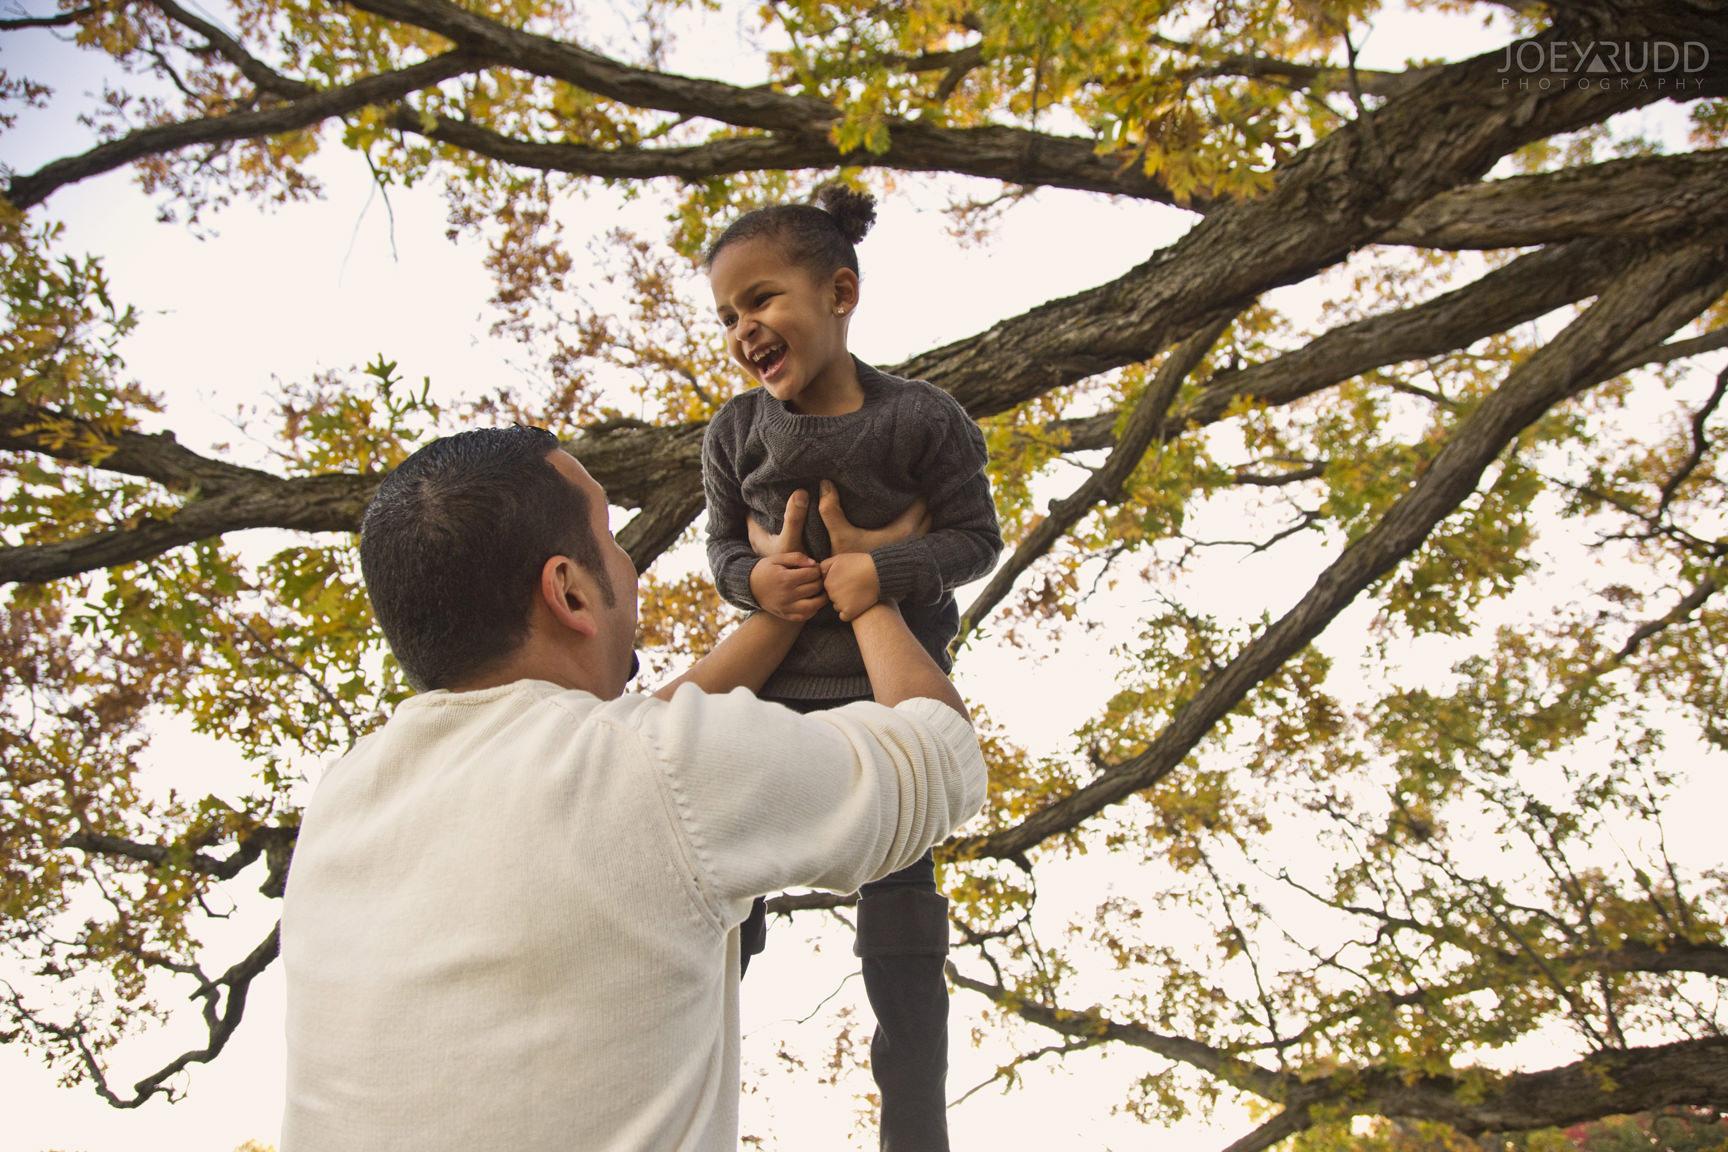 Ottawa Family Photographer Joey Rudd Photography Family Photo Session Arboretum Fall Candid Photography